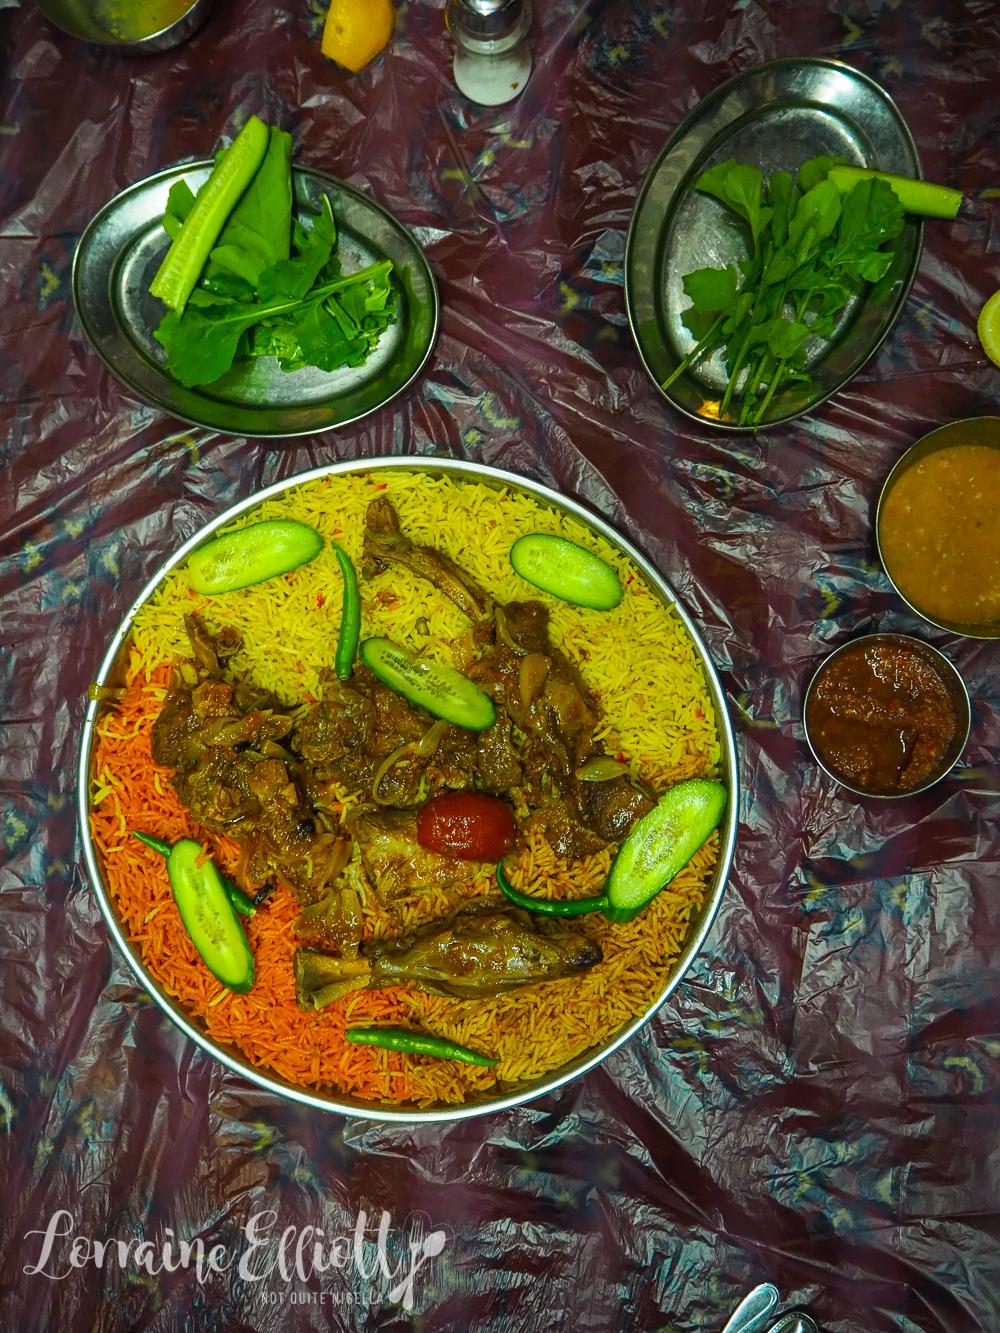 Dubai Food Culture Traditions SMCC